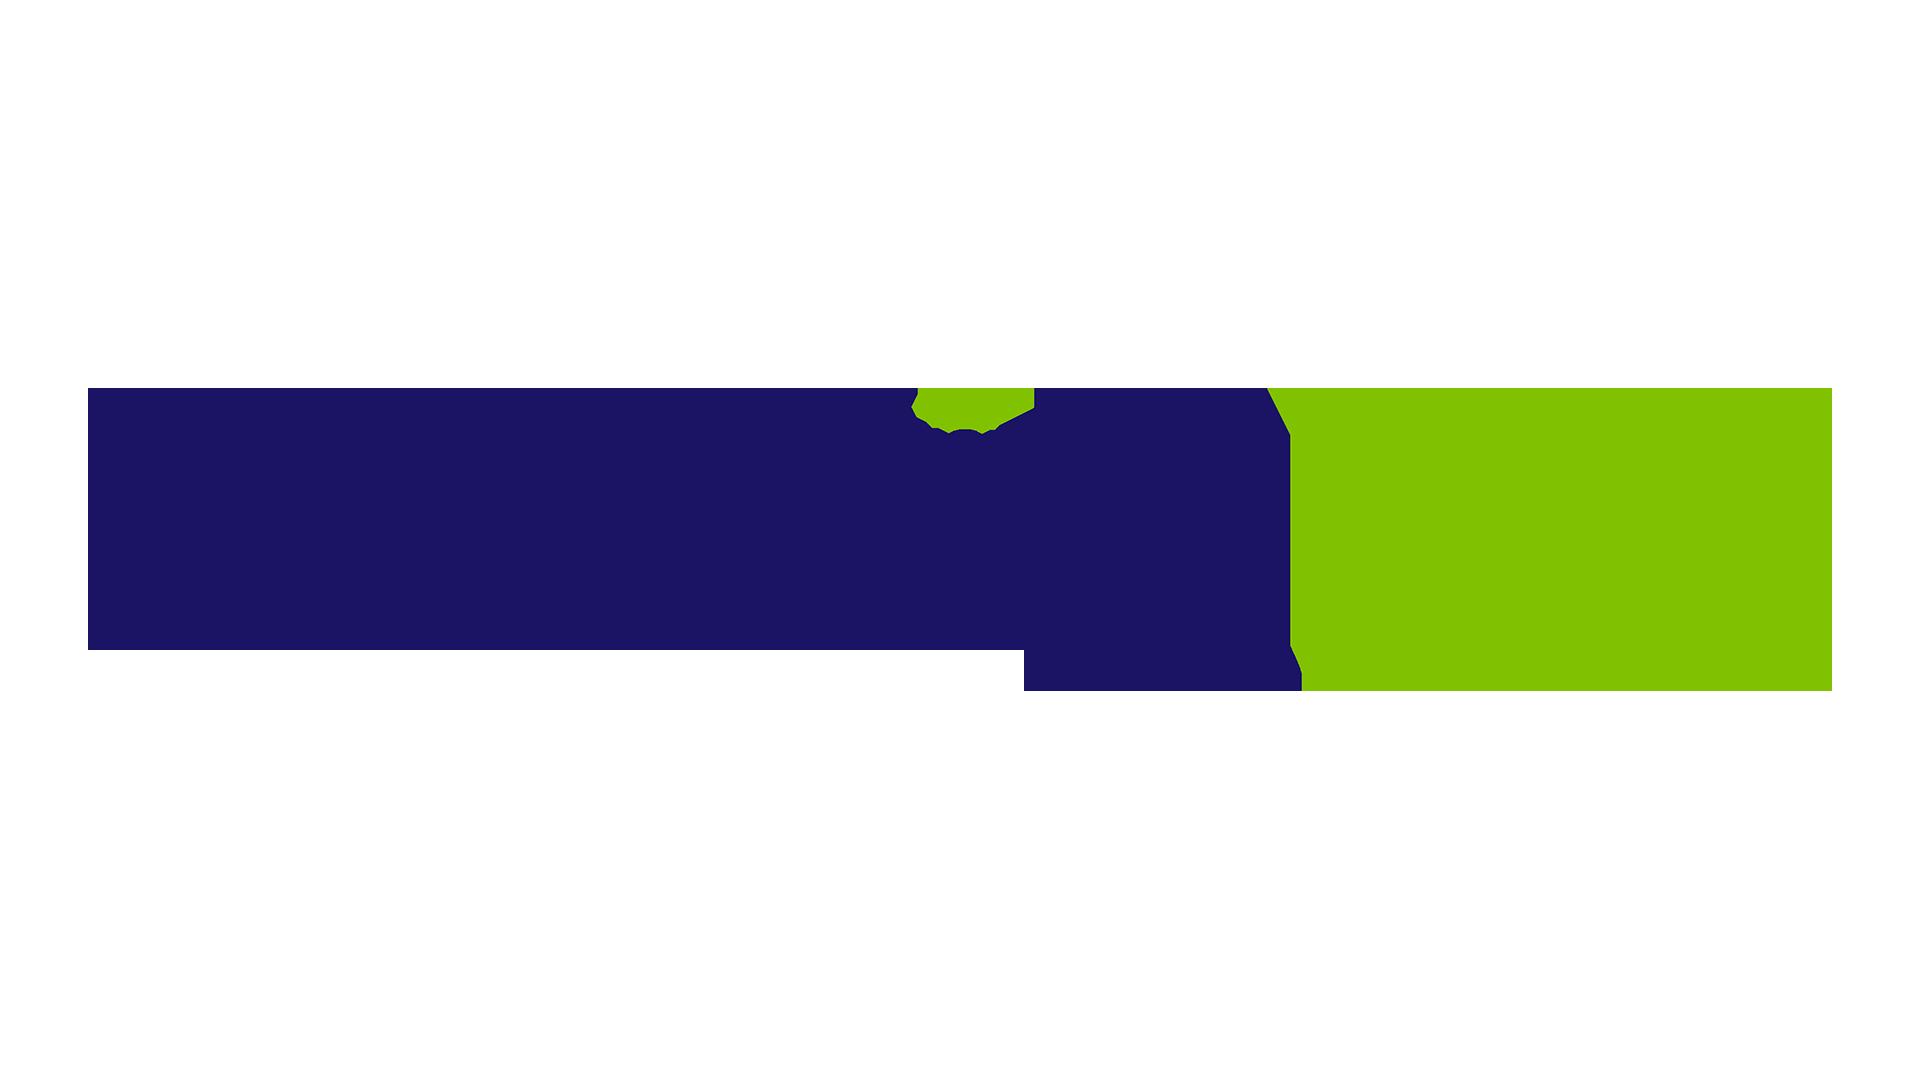 MarketingLand_1920x1080.png